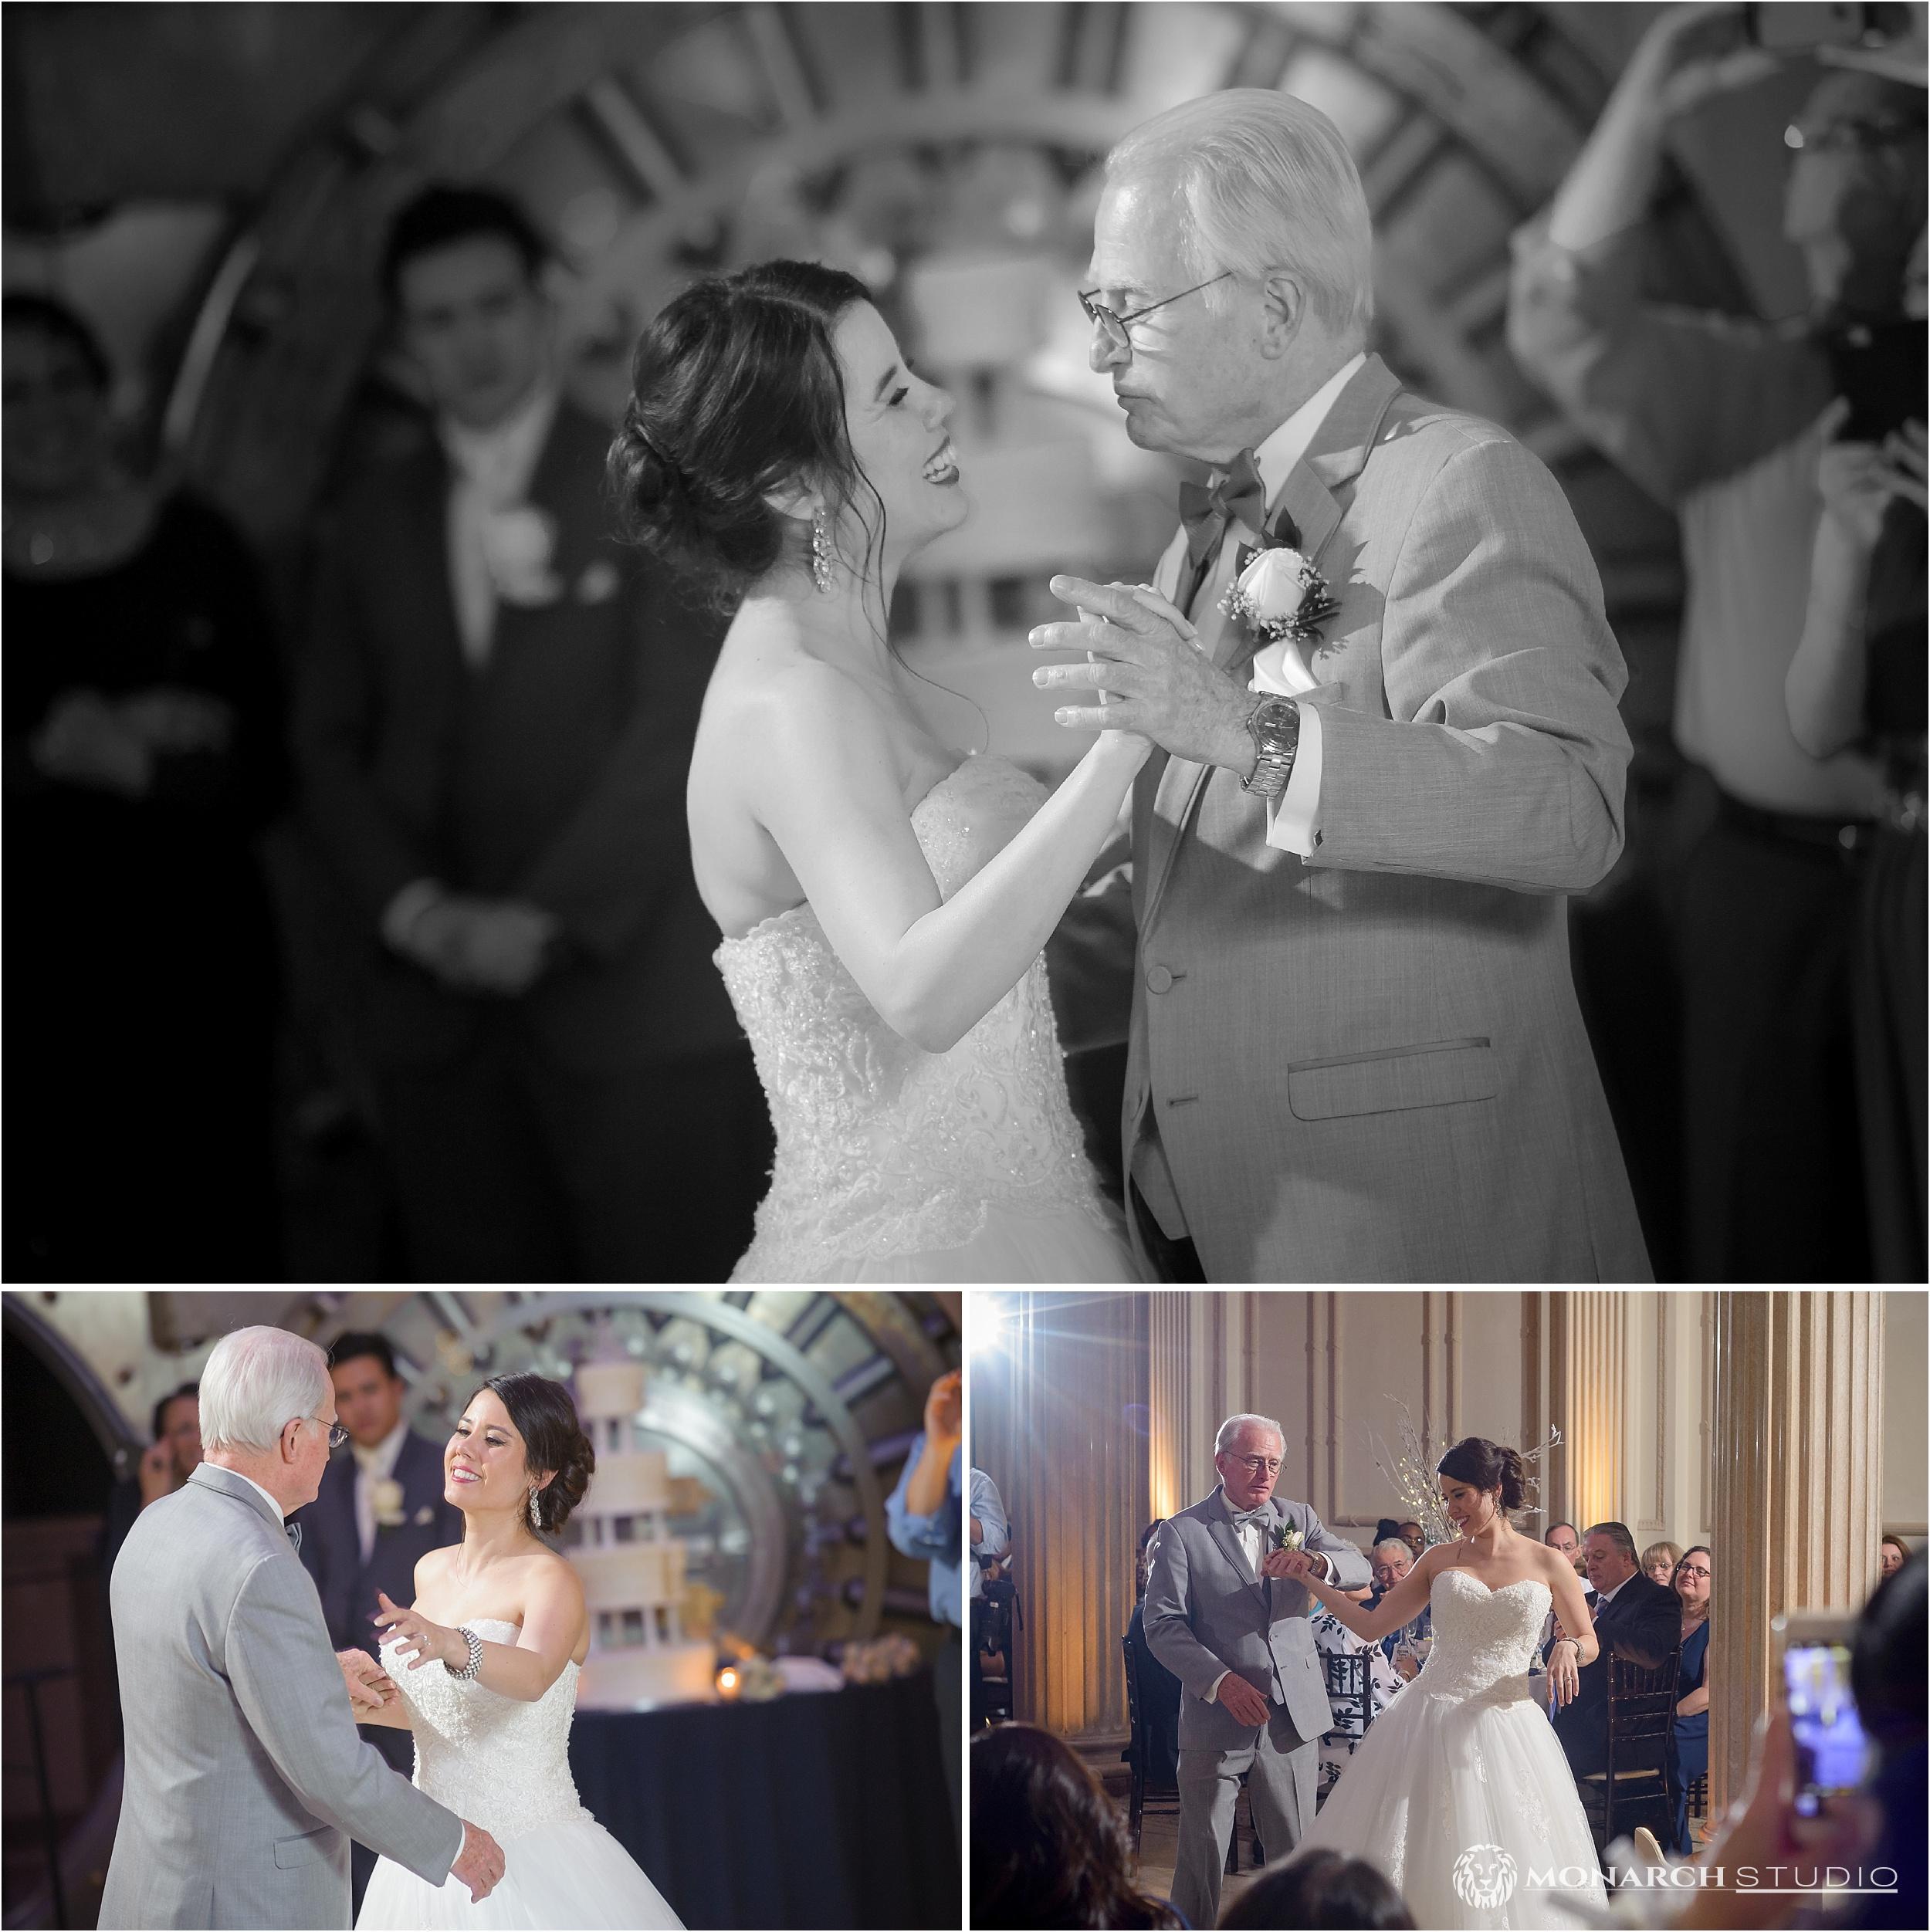 wedding-photographer-in-st-augustine-florida-treasury-103.jpg